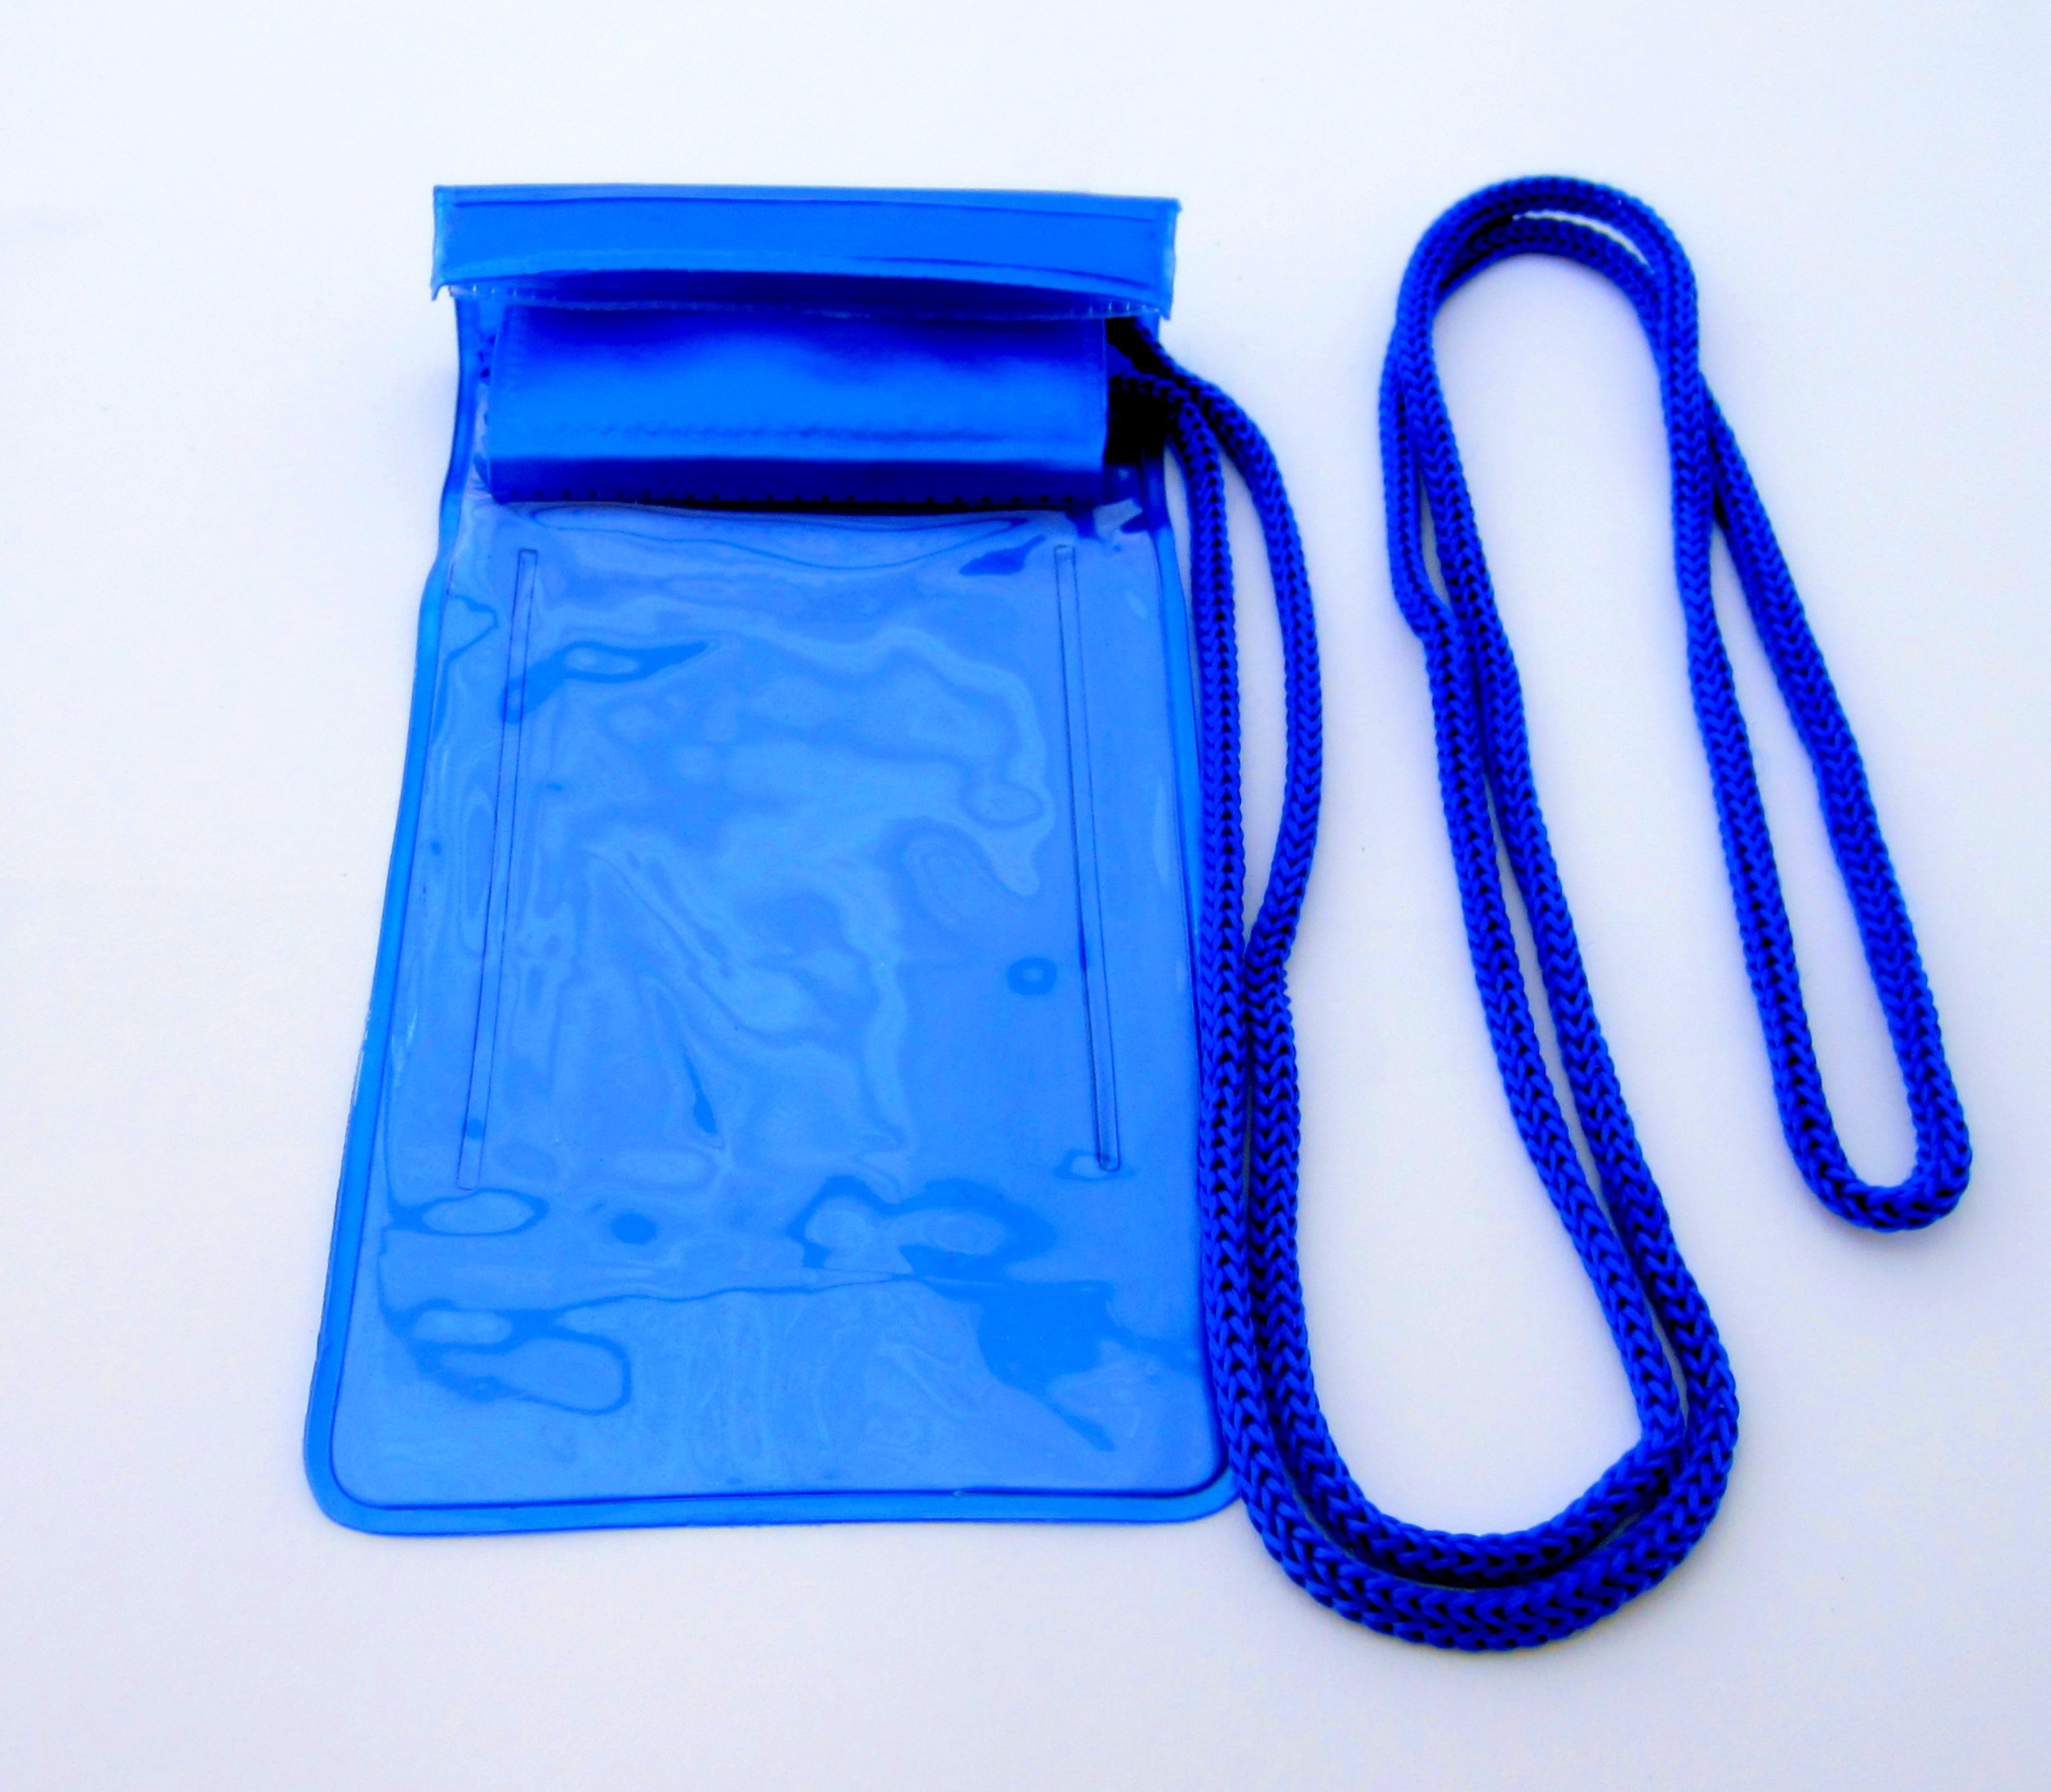 GPS Tracker Waterproof Bag Dimensions ~67mm x 96mm